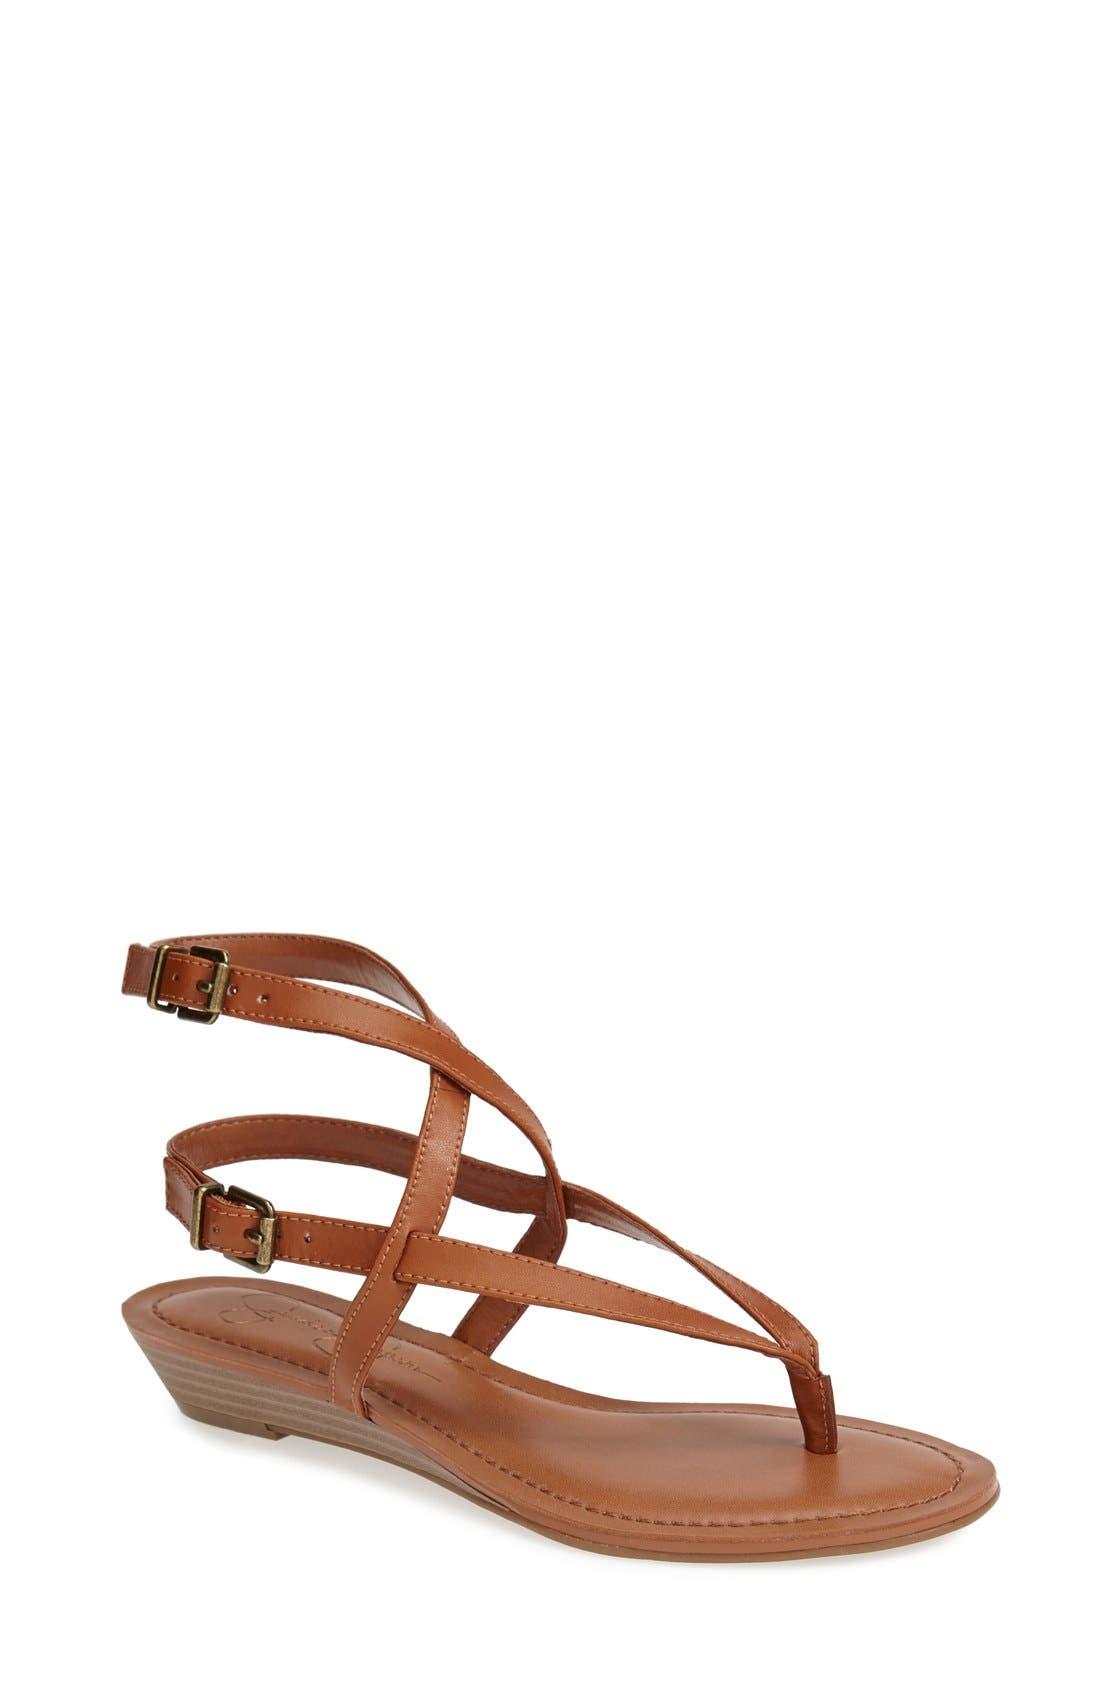 Alternate Image 1 Selected - Jessica Simpson 'Liliane' Sandal